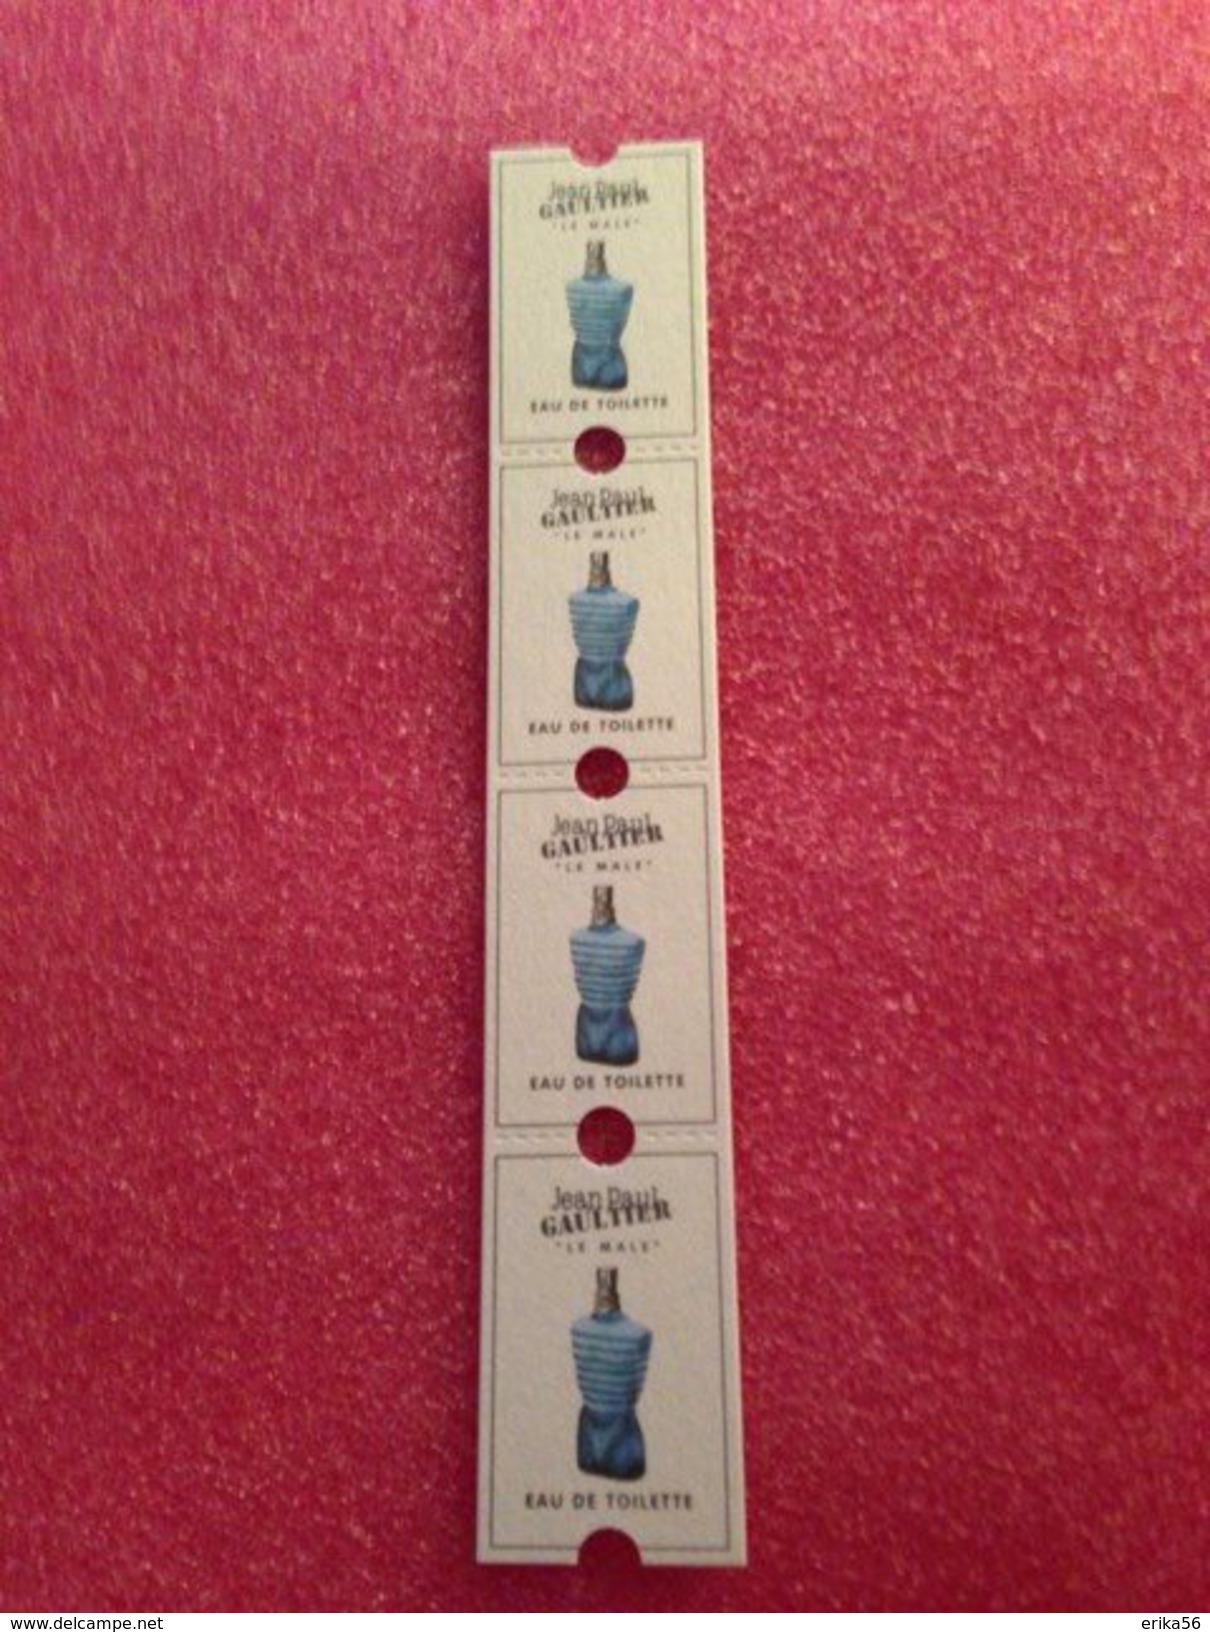 Le Male De  Jean Paul Gaultier  Ticket De Cinéma - Cartas Perfumadas